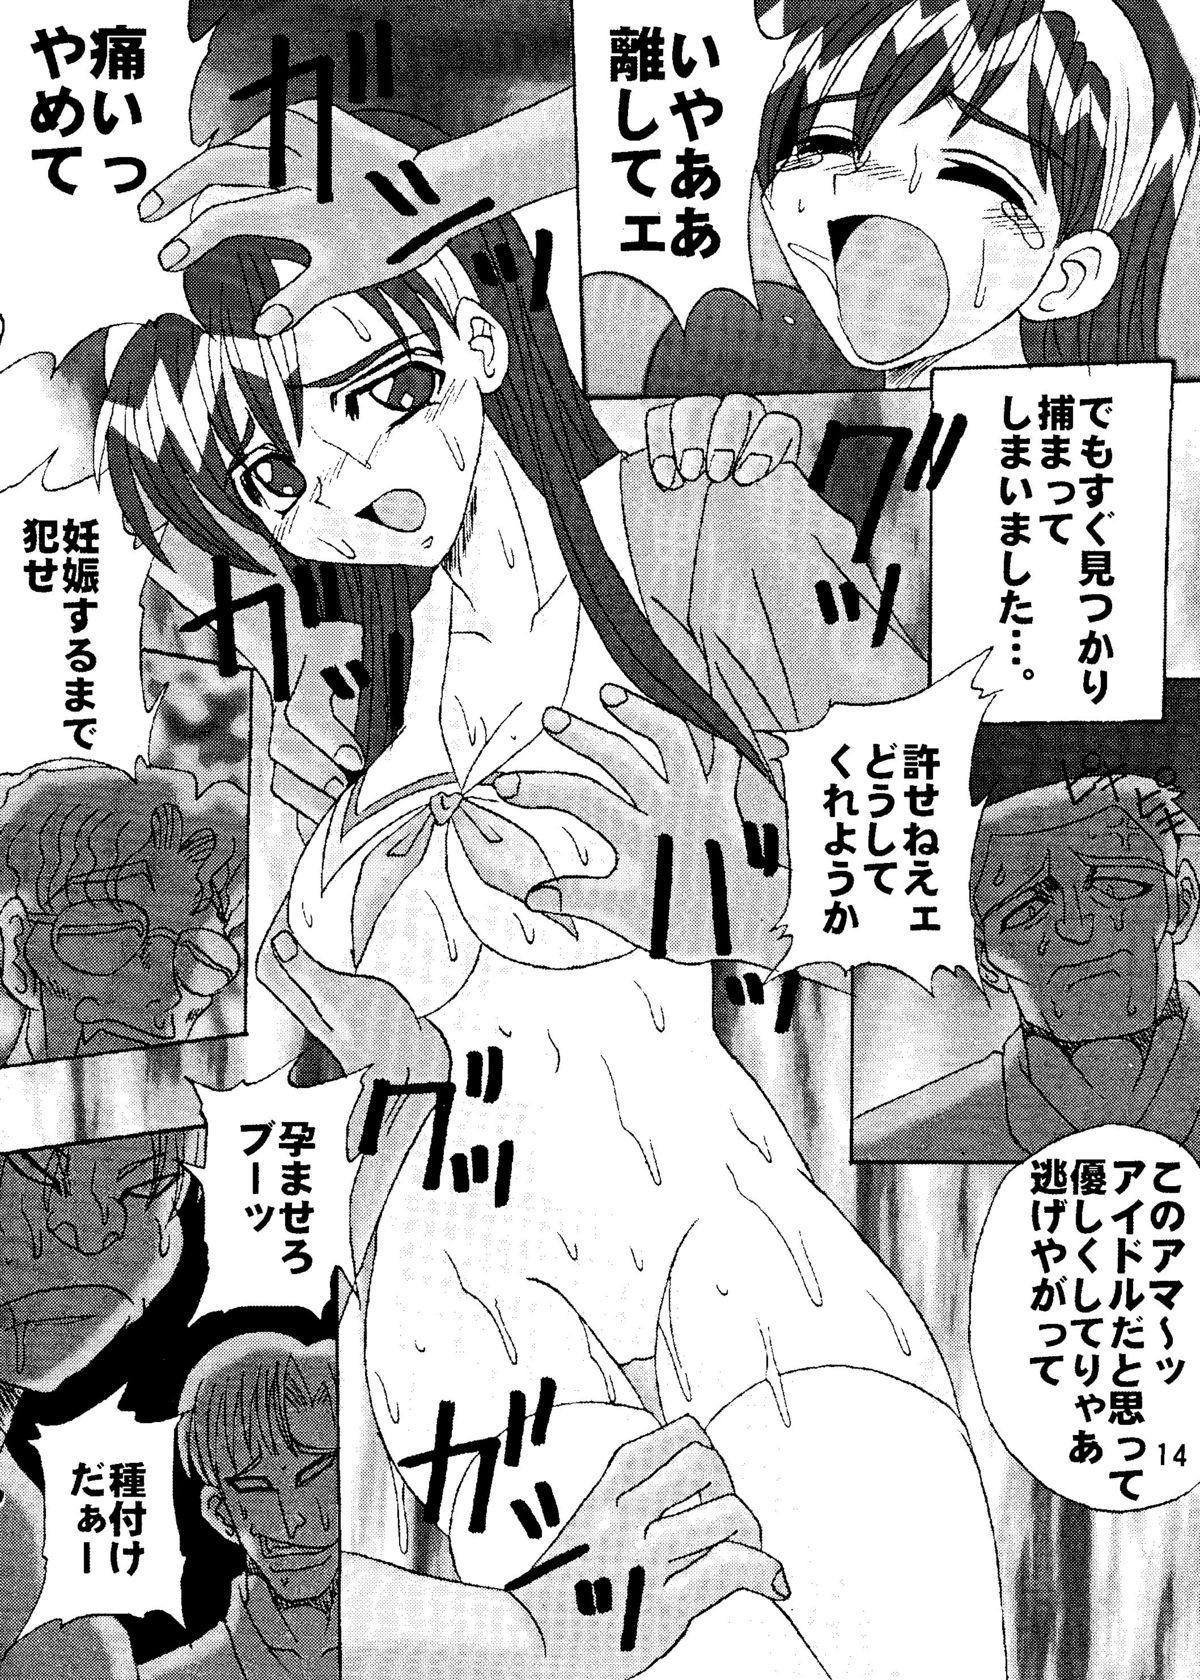 Dandyism 4 (To Heart, Card Captor Sakura, White Album] 15